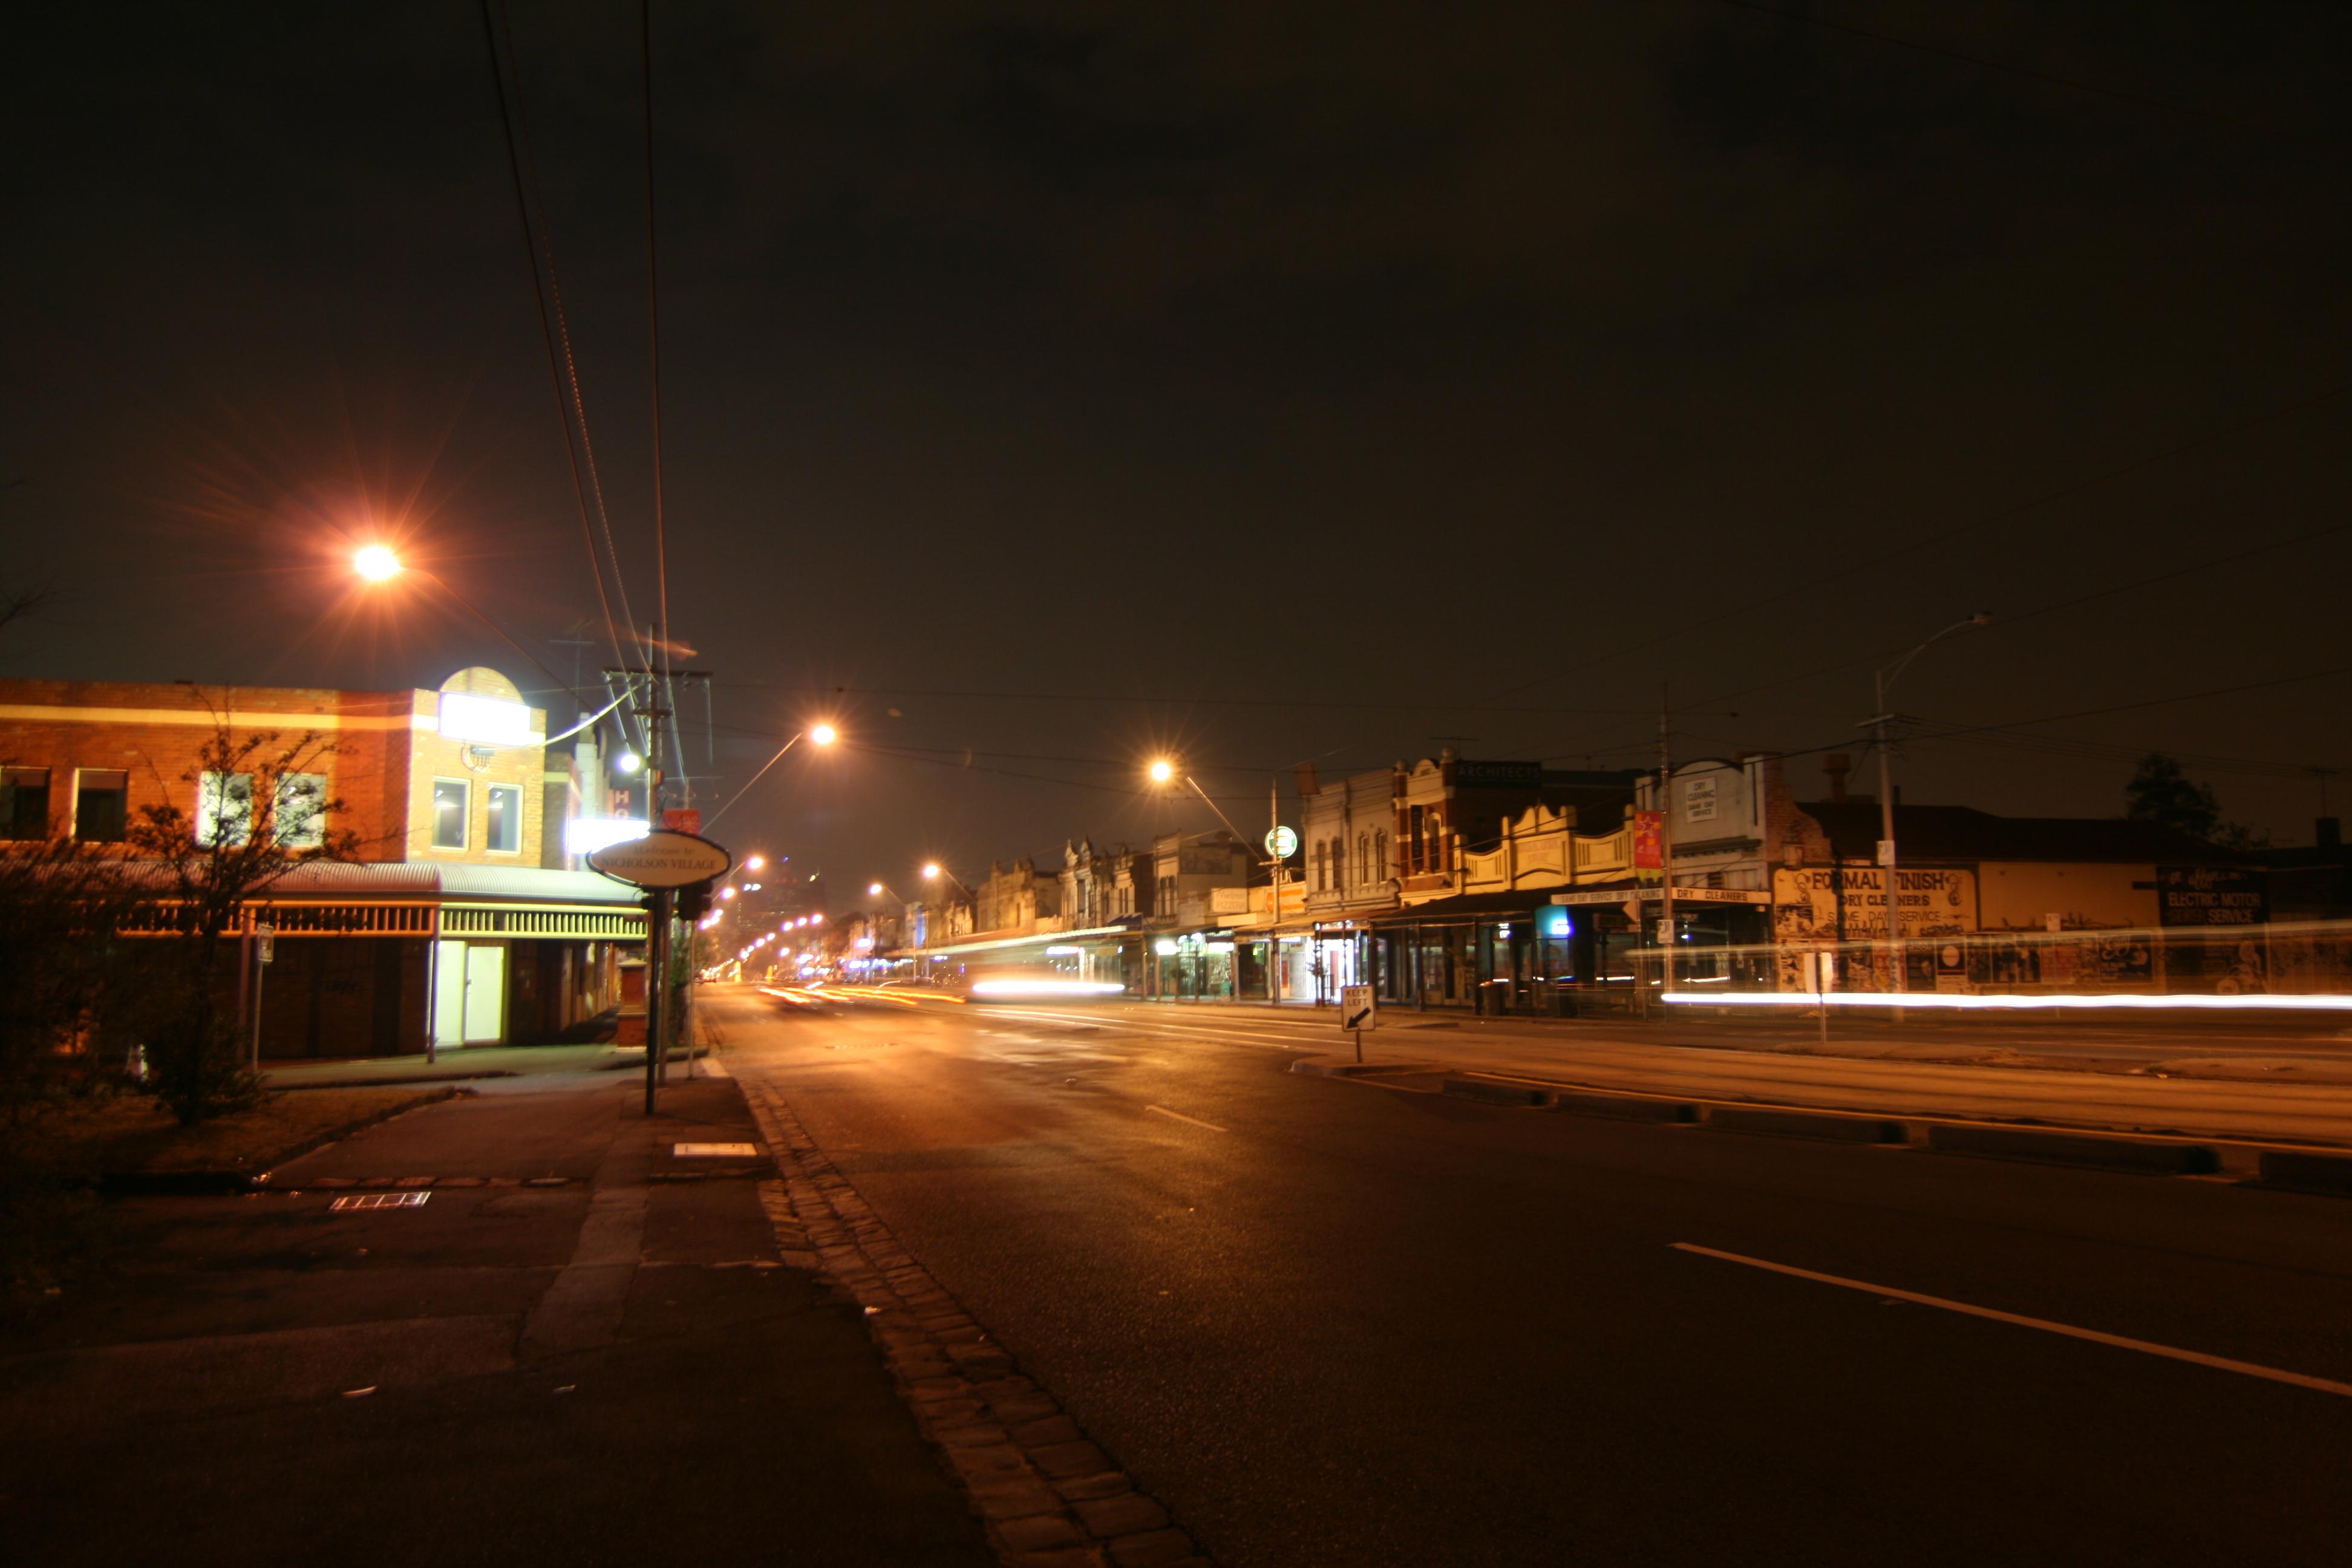 city street corner at night - photo #13